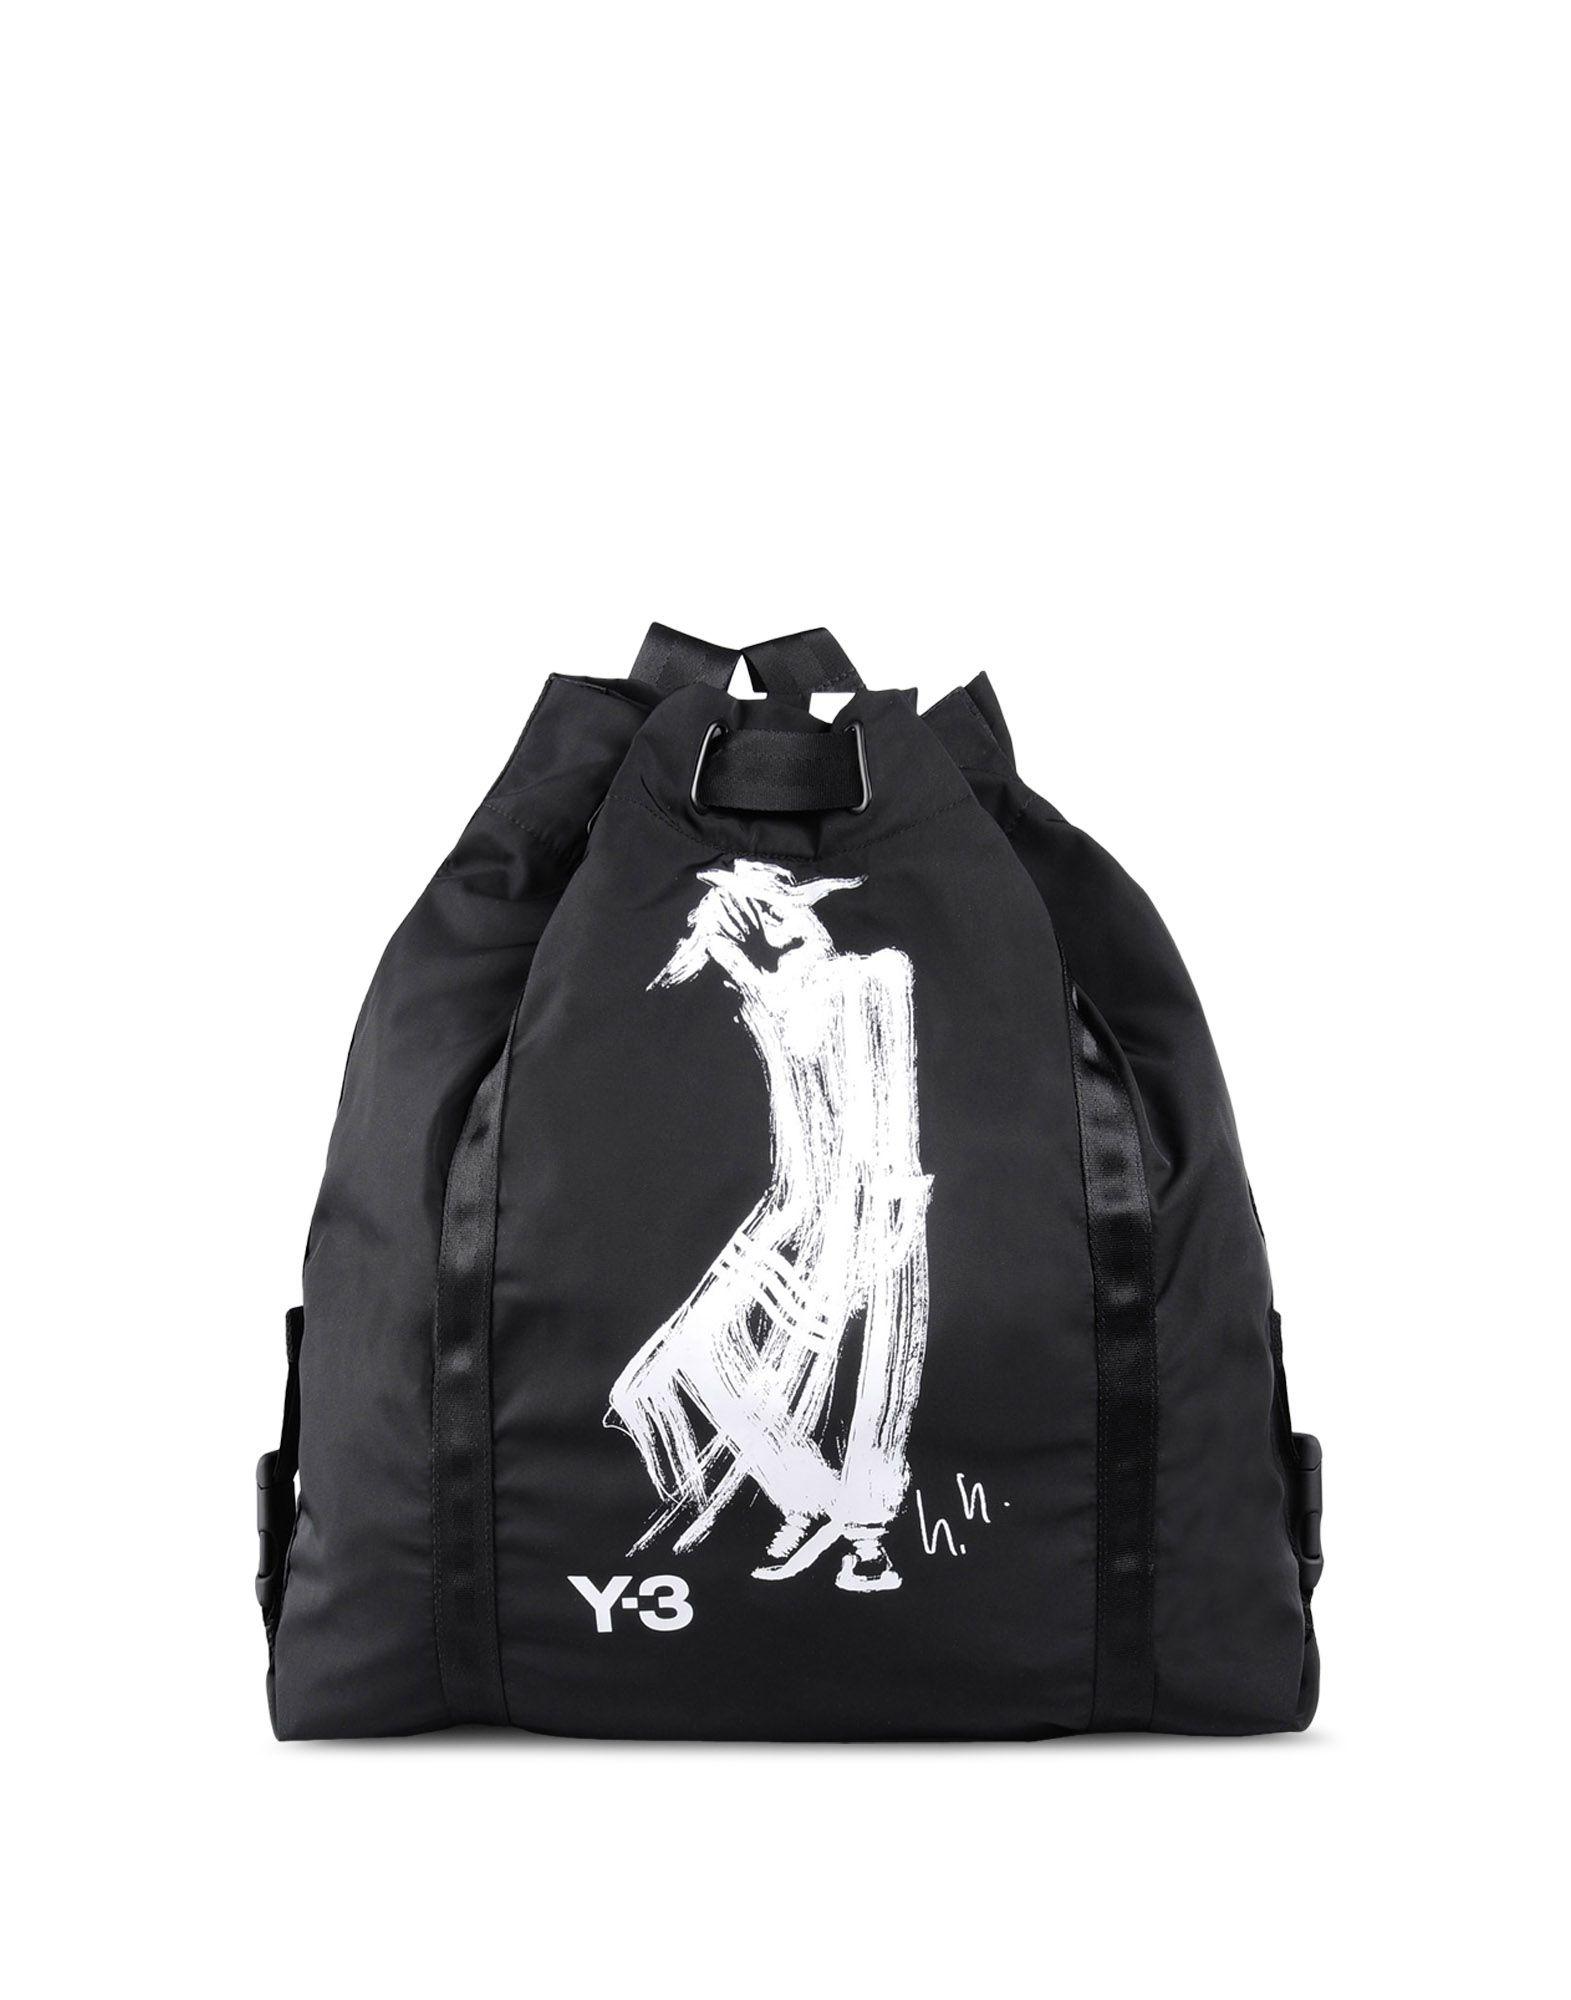 33f8b1c23da8 Lyst - Y-3 Printed Backpack in Black for Men